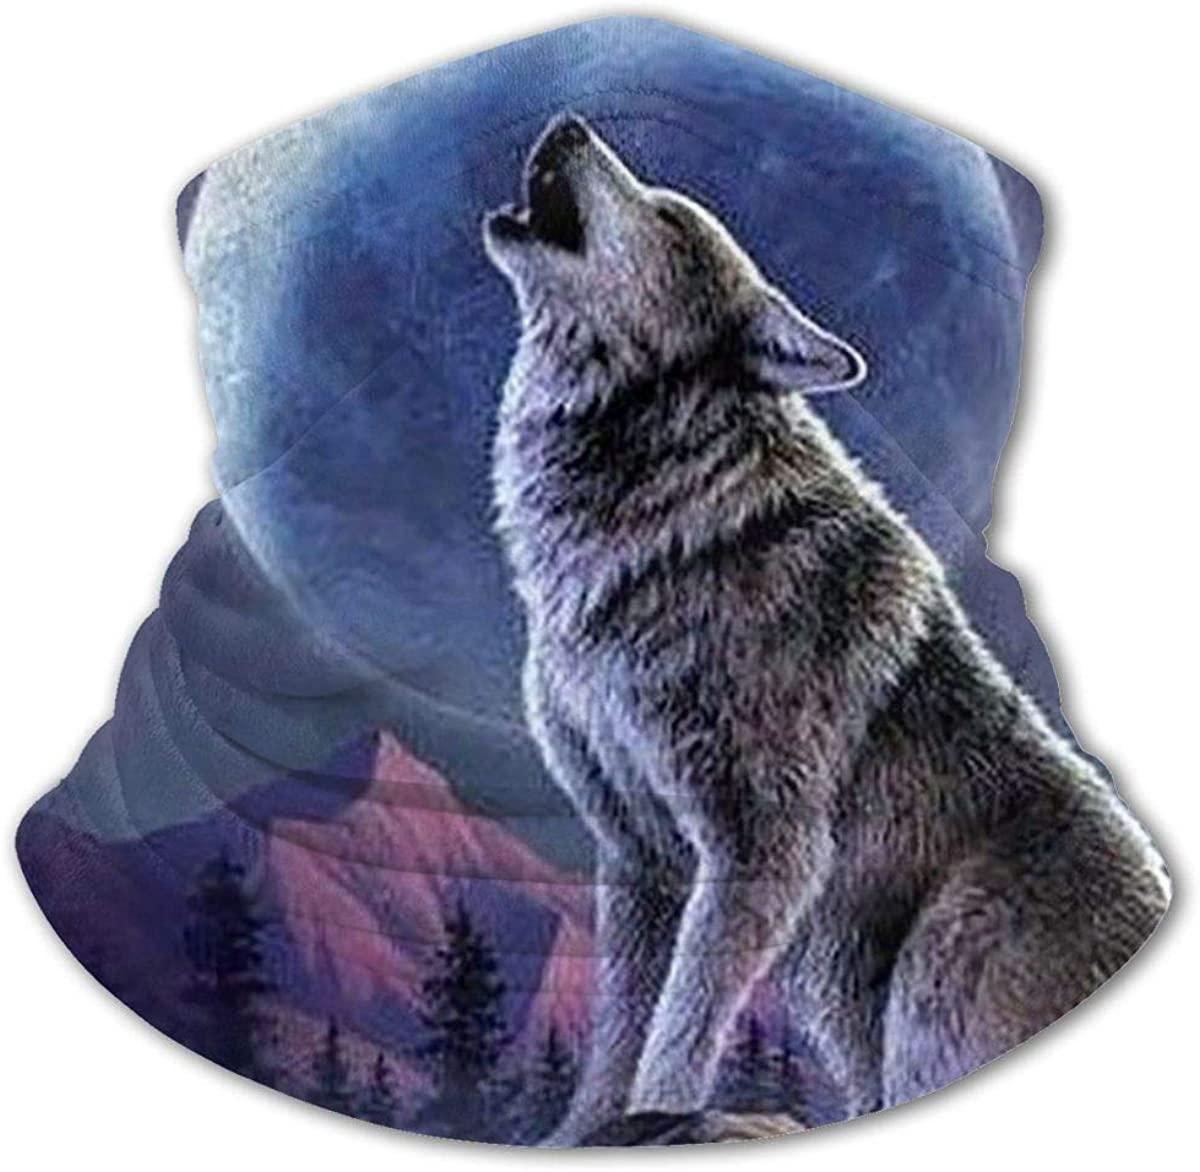 Wolf And Moon Headwear For Girls And Boys, Head Wrap, Neck Gaiter, Headband, Tenn Fishing Mask, Magic Scarf, Tube Mask, Face Bandana Mask For Camping Running Cycling